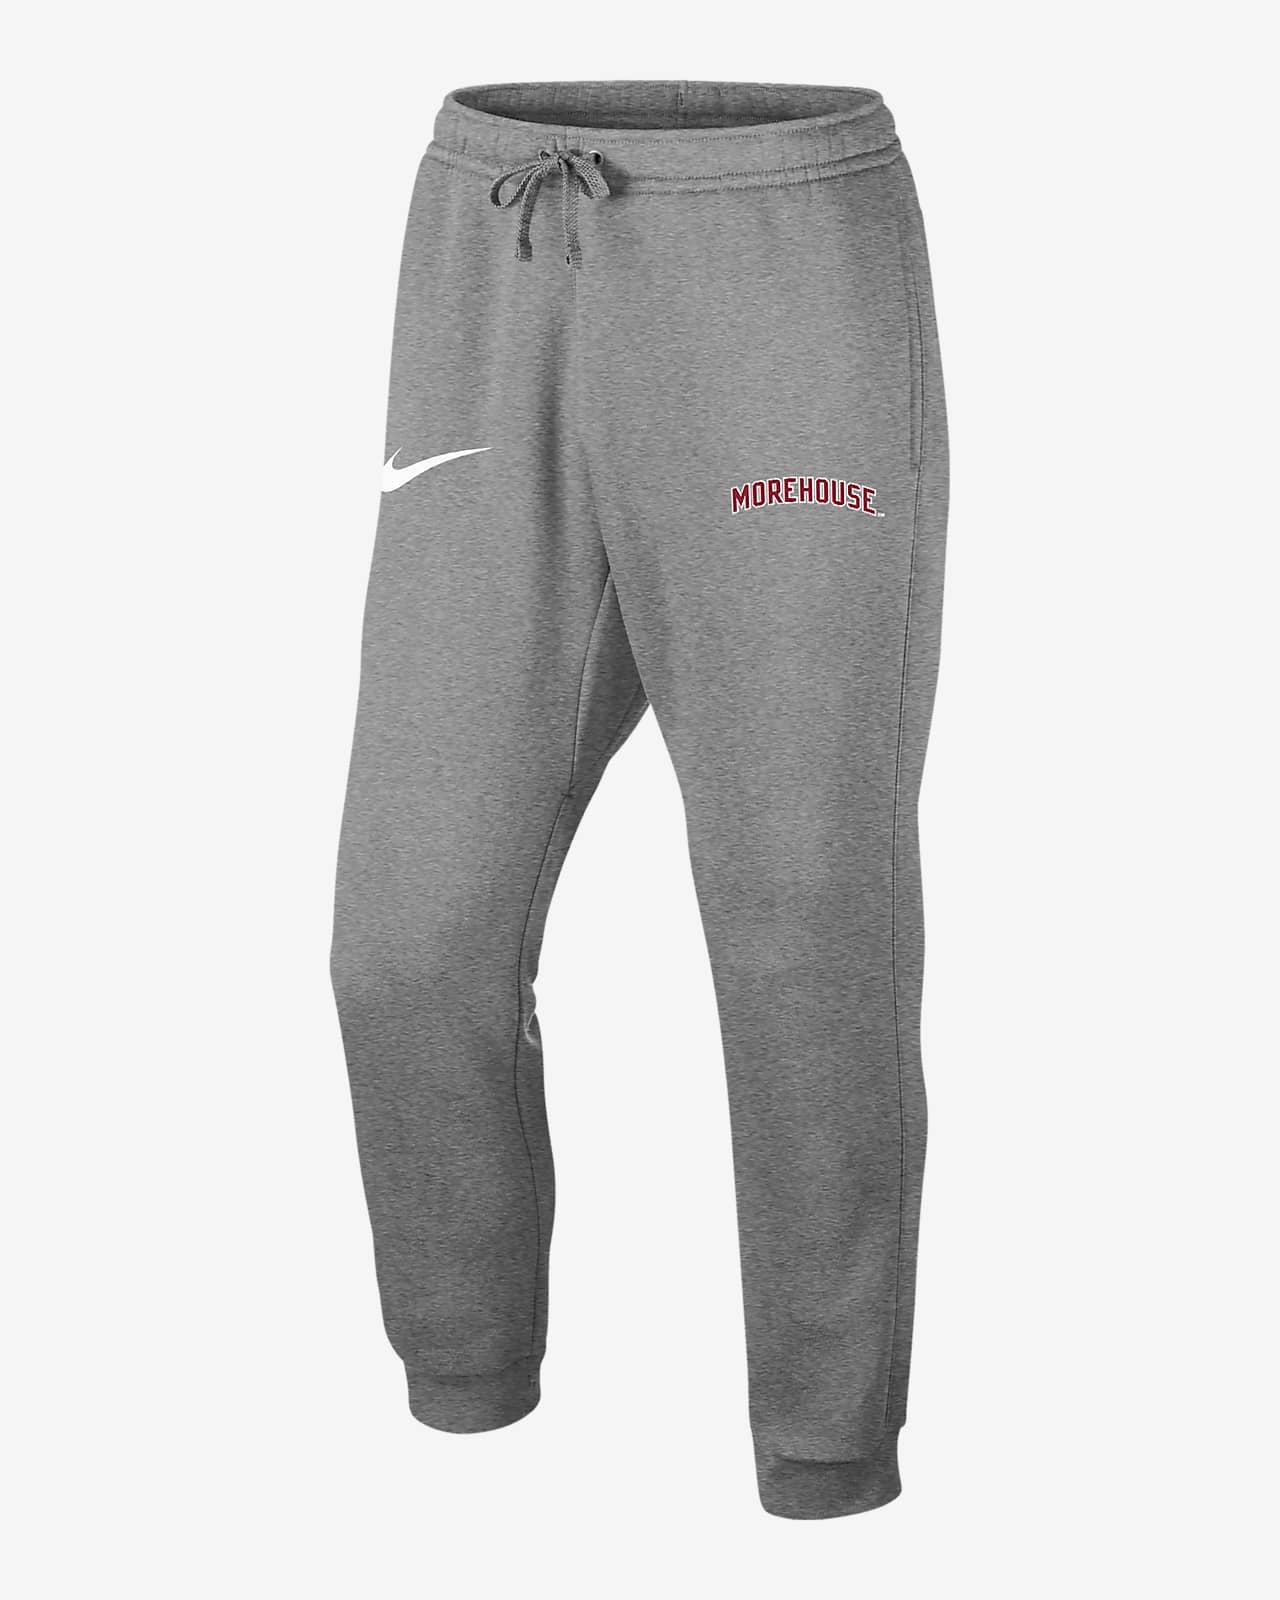 Nike College Club Fleece (Morehouse) Joggers